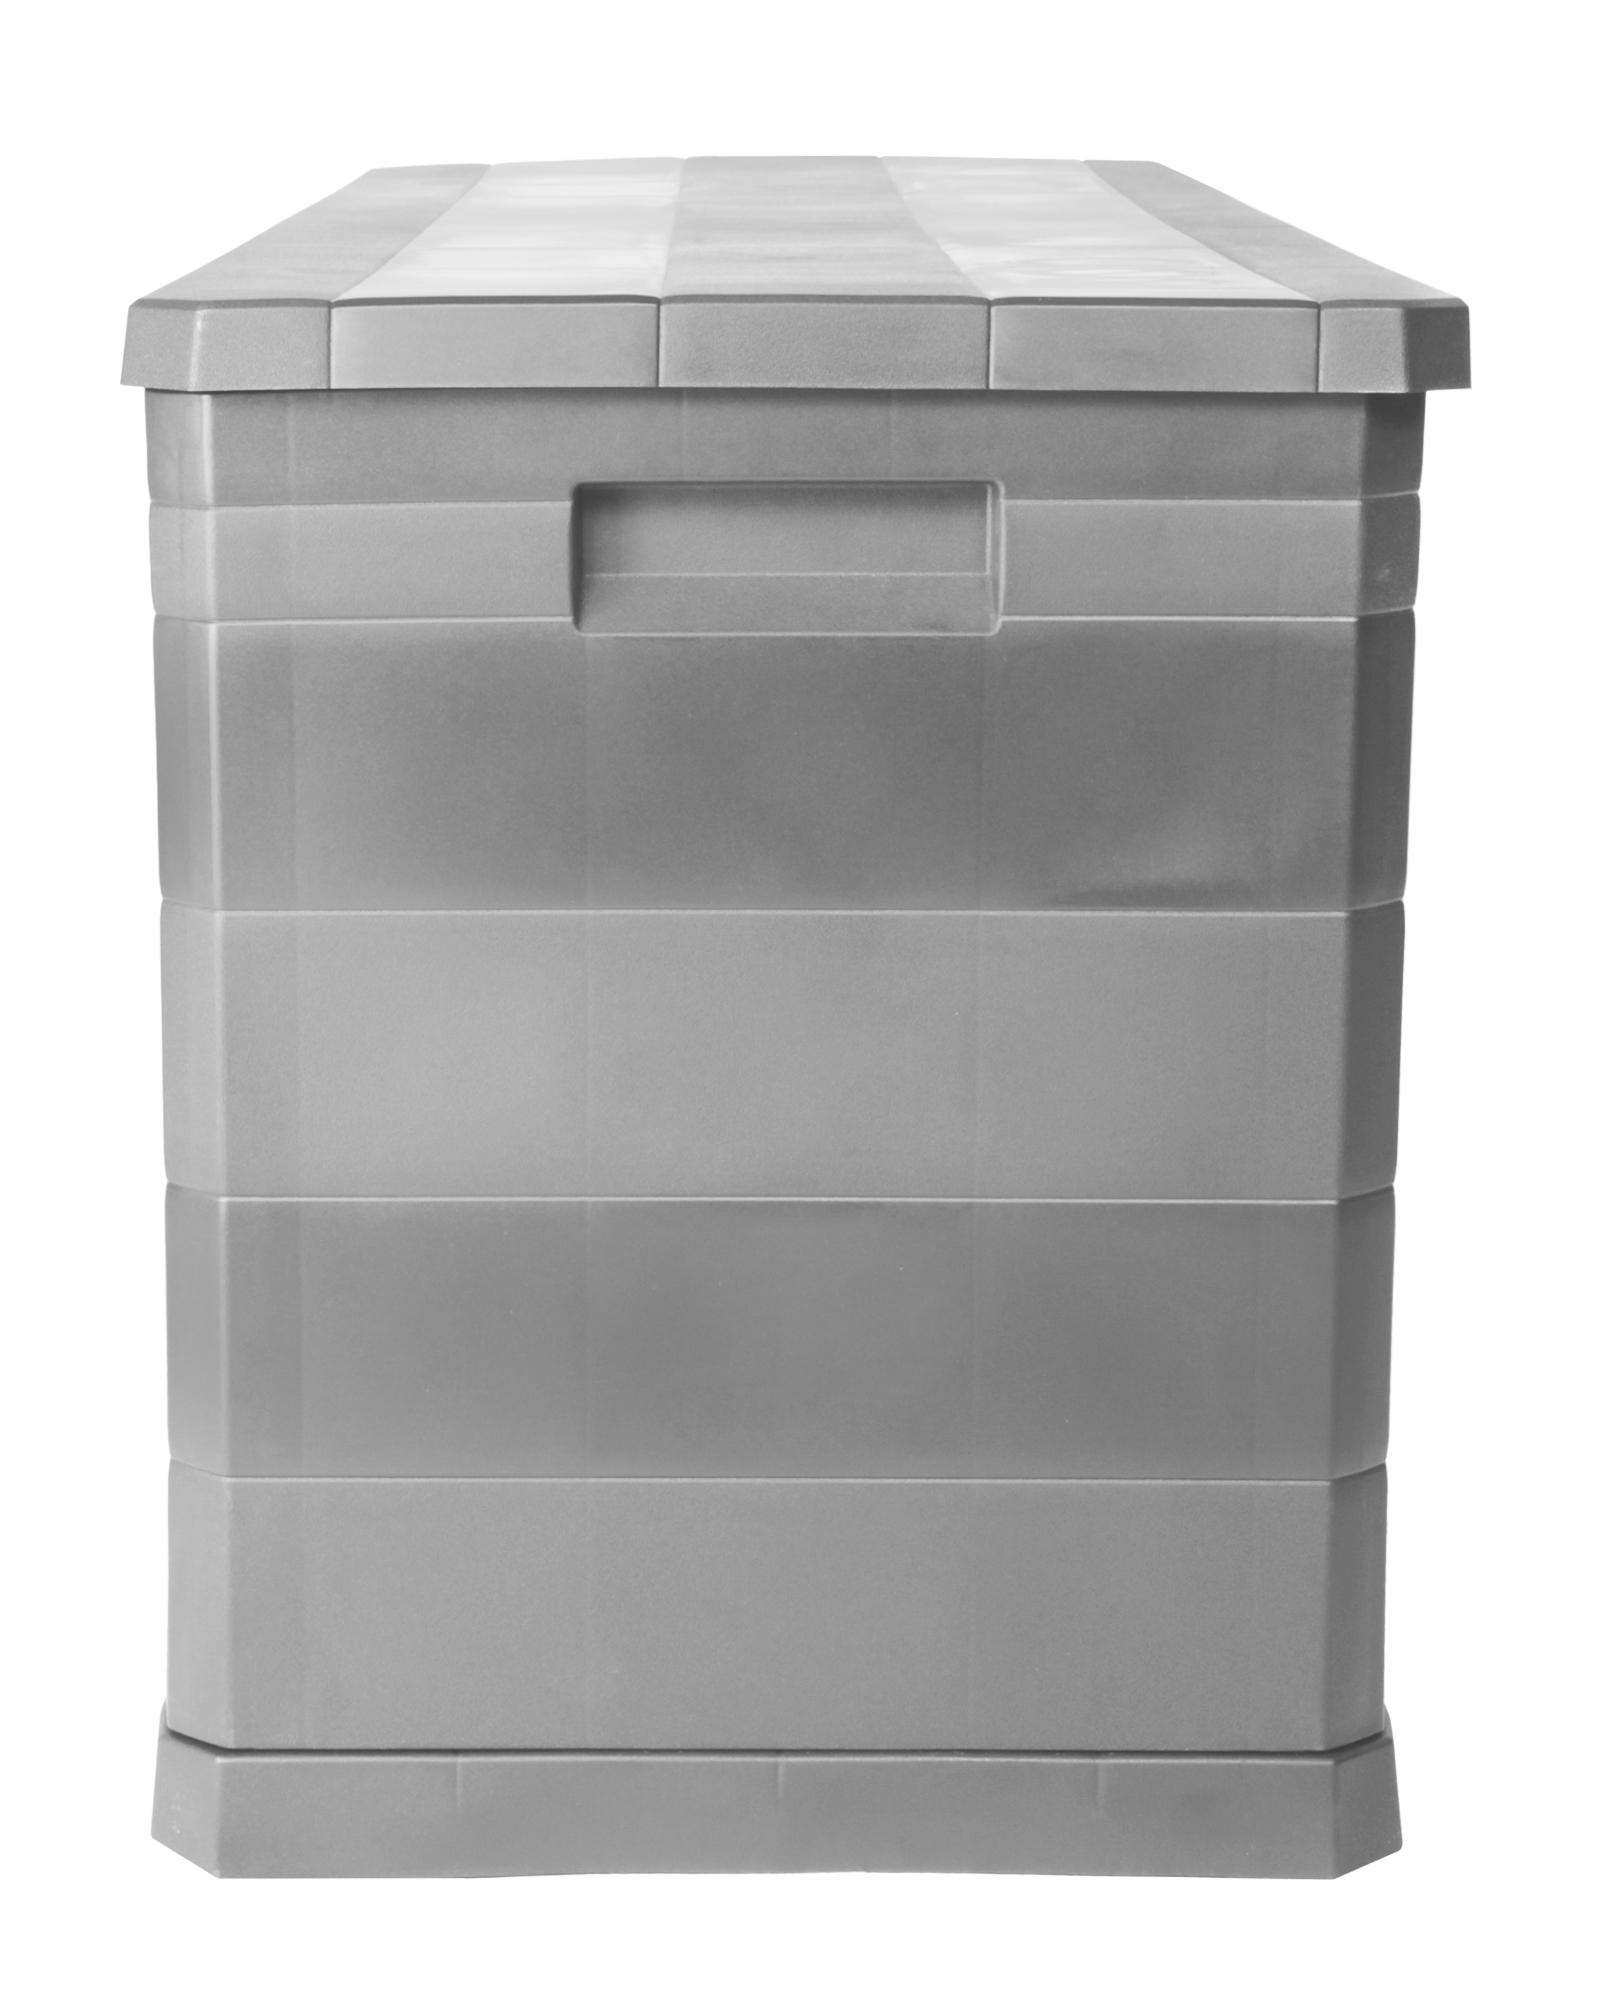 Kettler Gartenmobel Stapelsessel :  Auflagenbox Gartentruhe Elegance warmgrau jetzt günstig kaufen